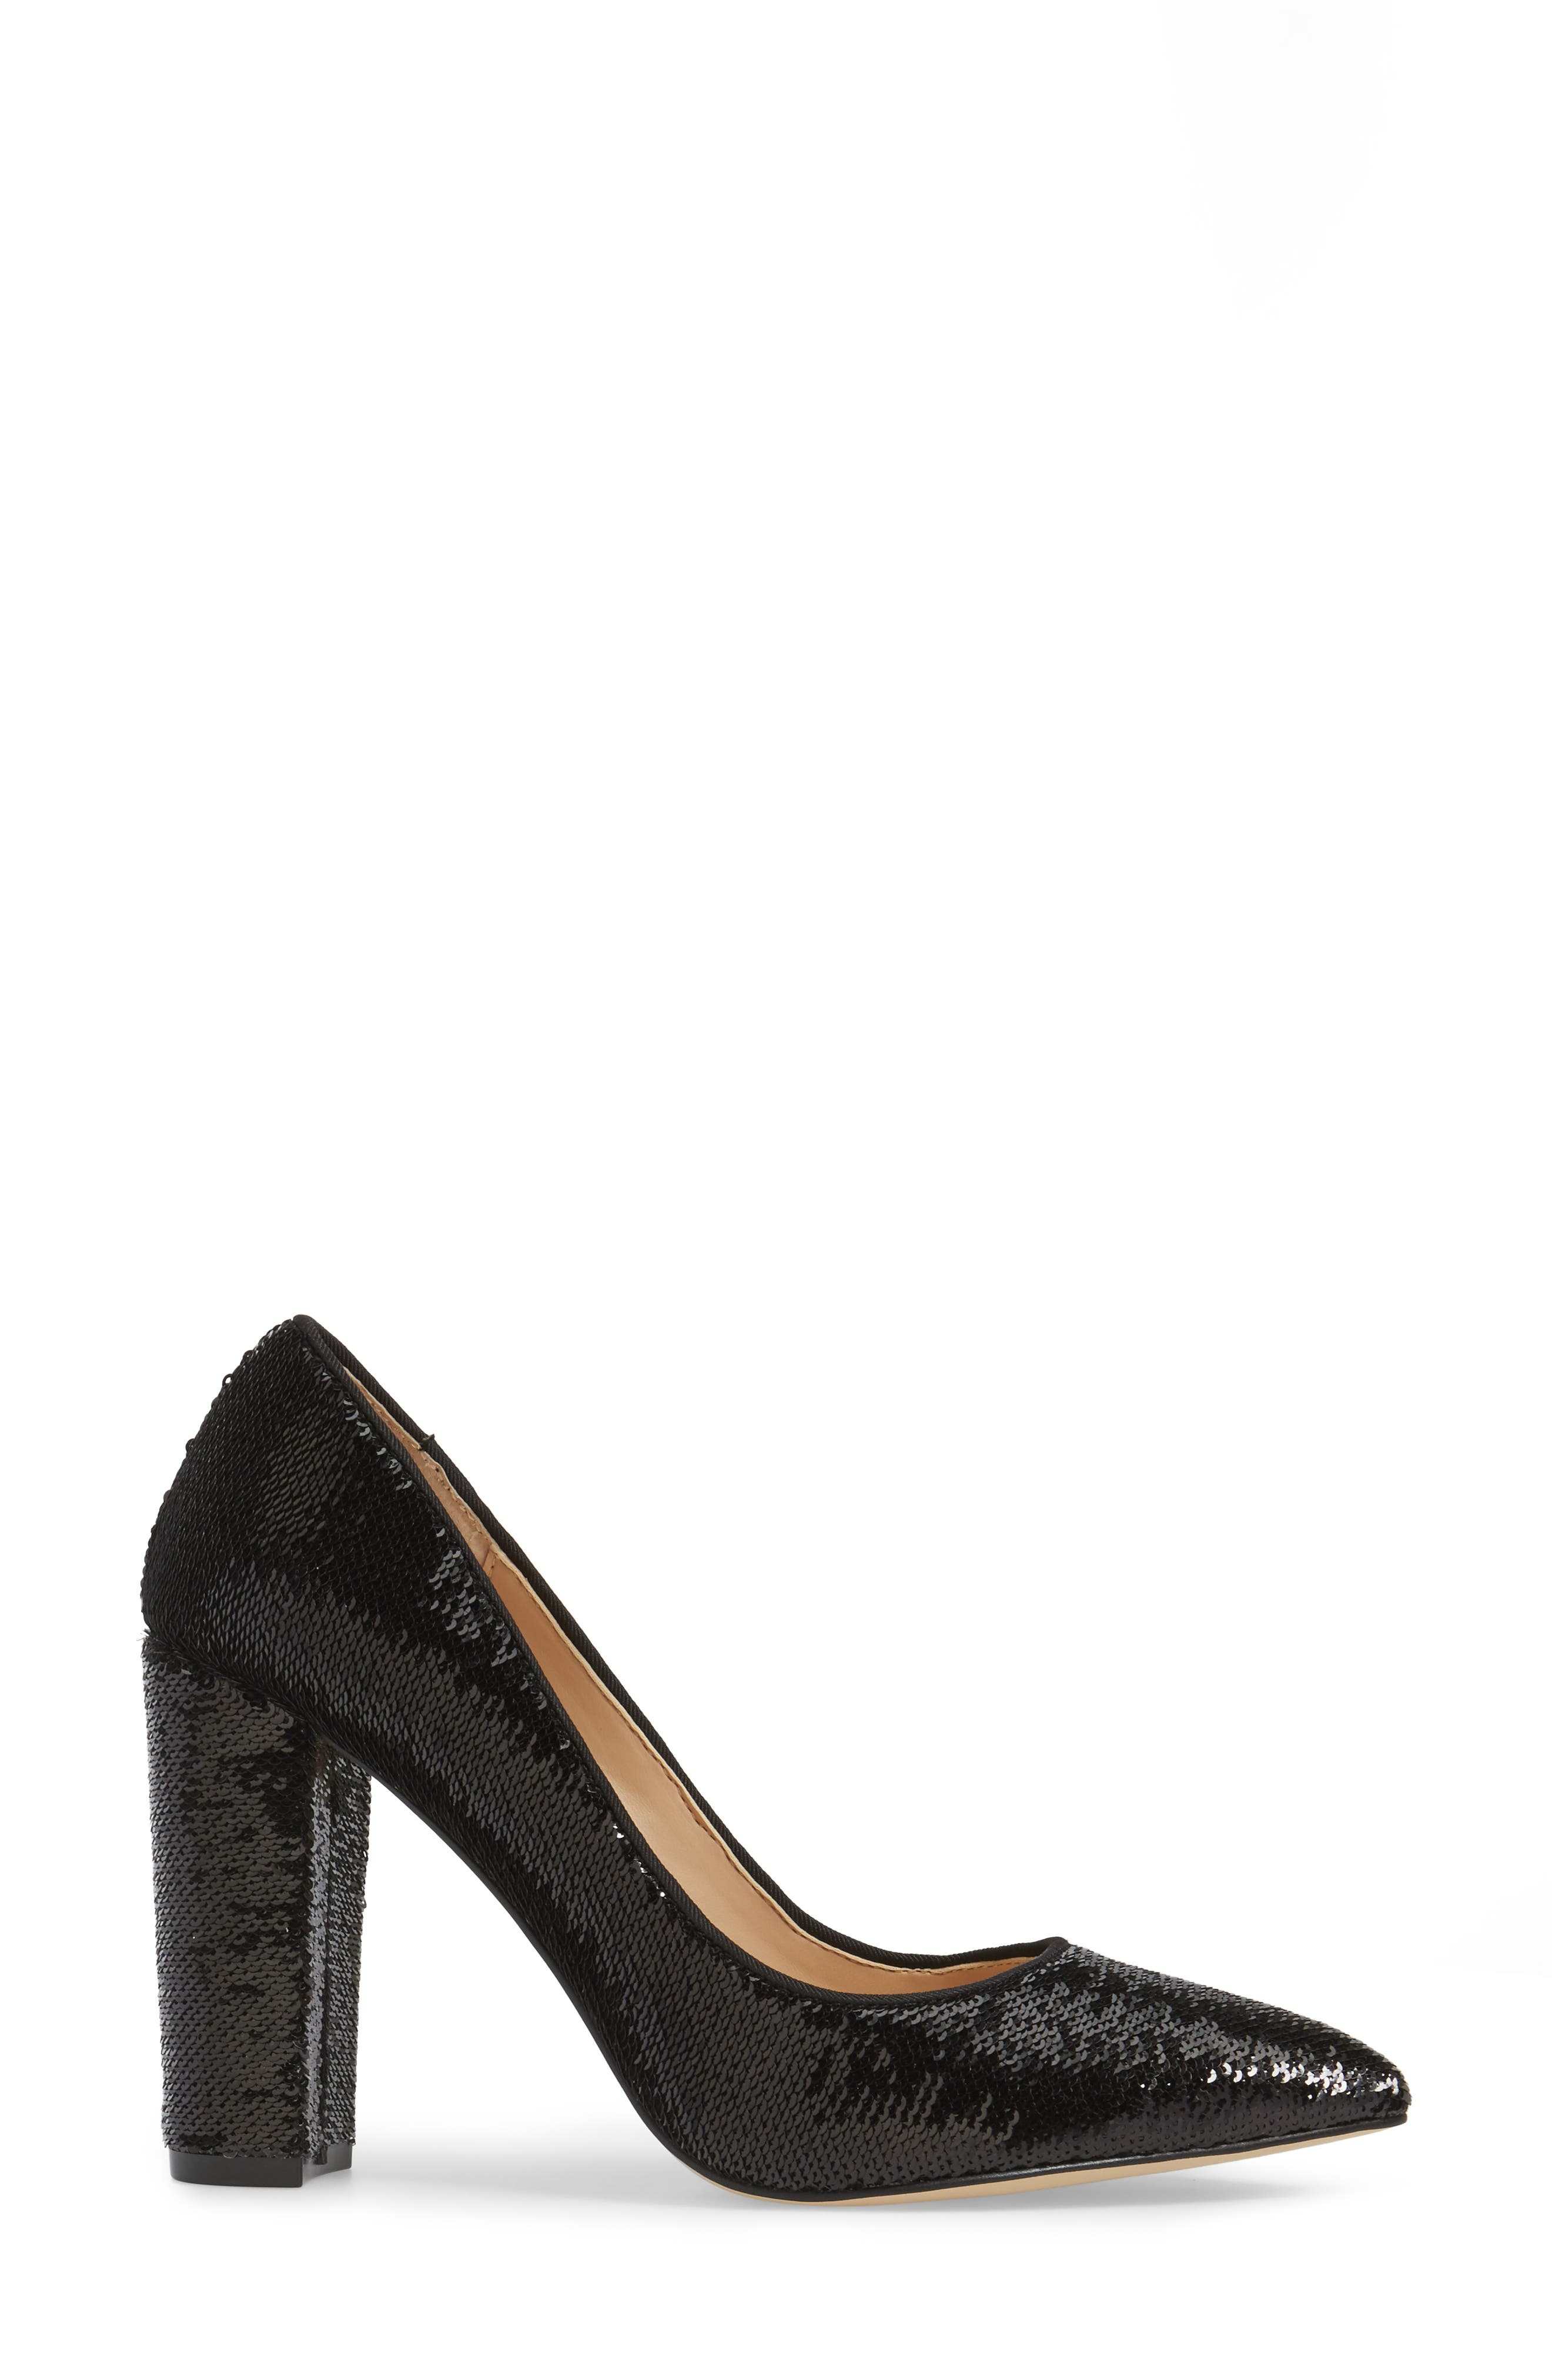 Alternate Image 3  - Jewel Badgley Mischka Luxury Pointy Toe Pump (Women)